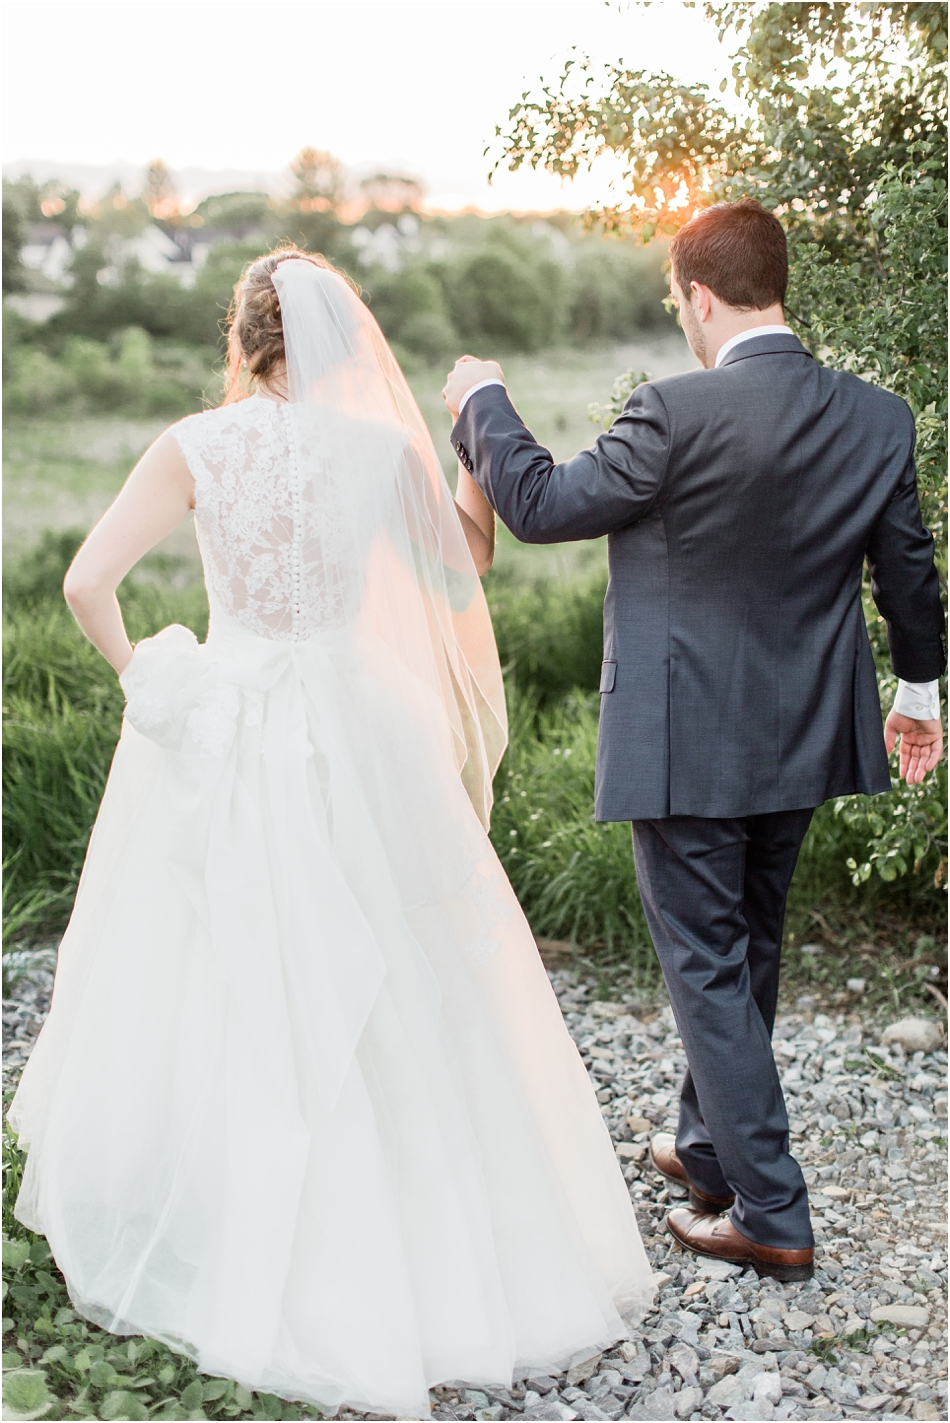 barn_at_gibbett_hill_groton_boston_massachusetts_cape_cod_new_england_wedding_photographer_Meredith_Jane_Photography_photo_1556.jpg